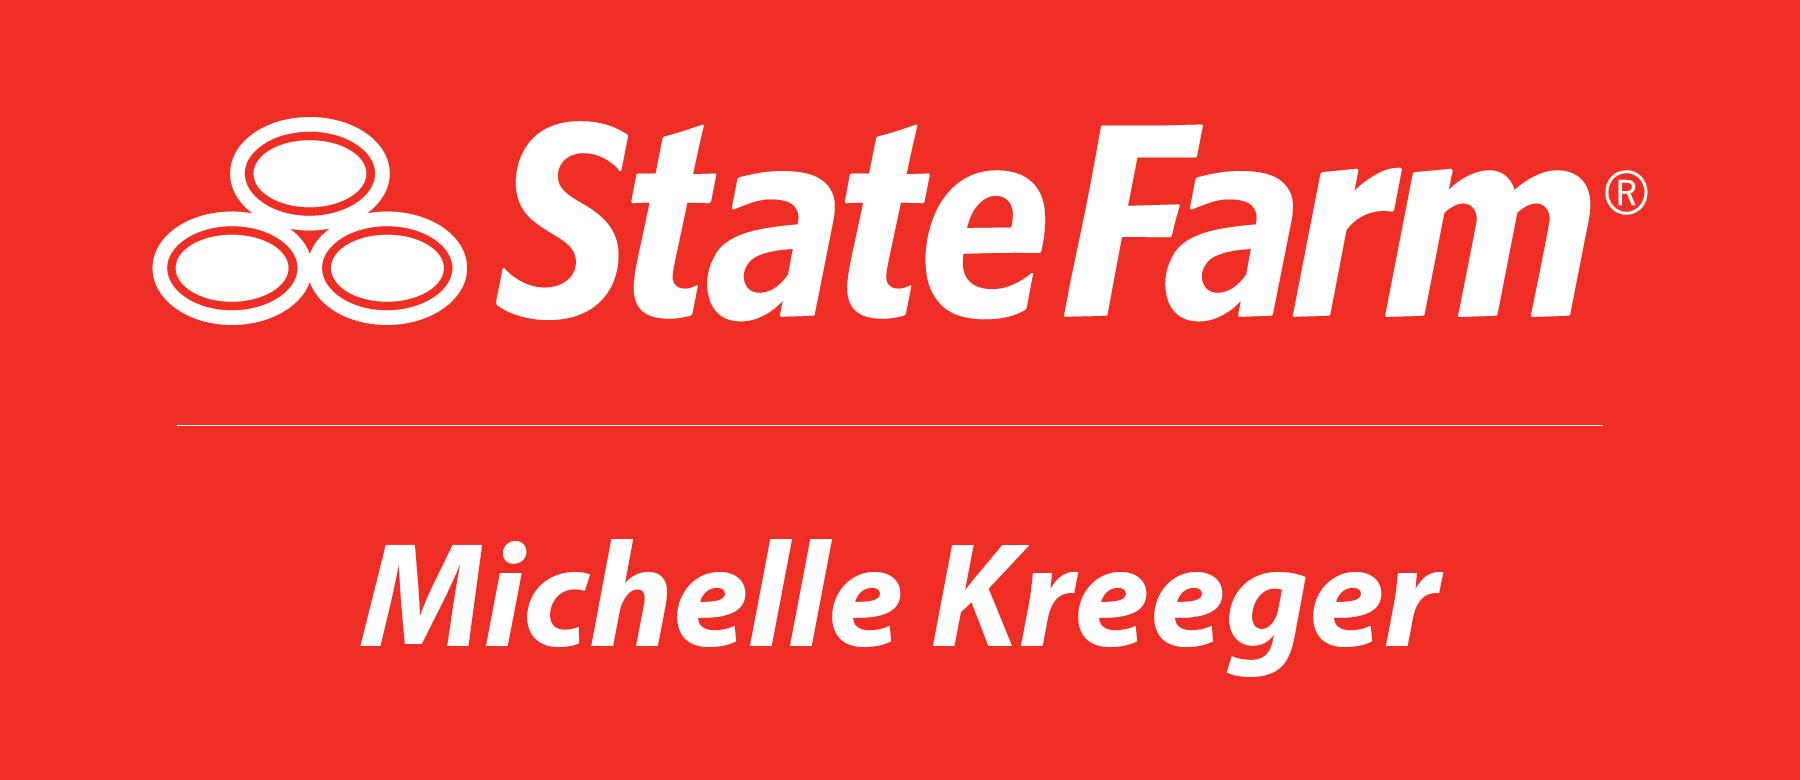 StateFarm-MichelleK.jpg